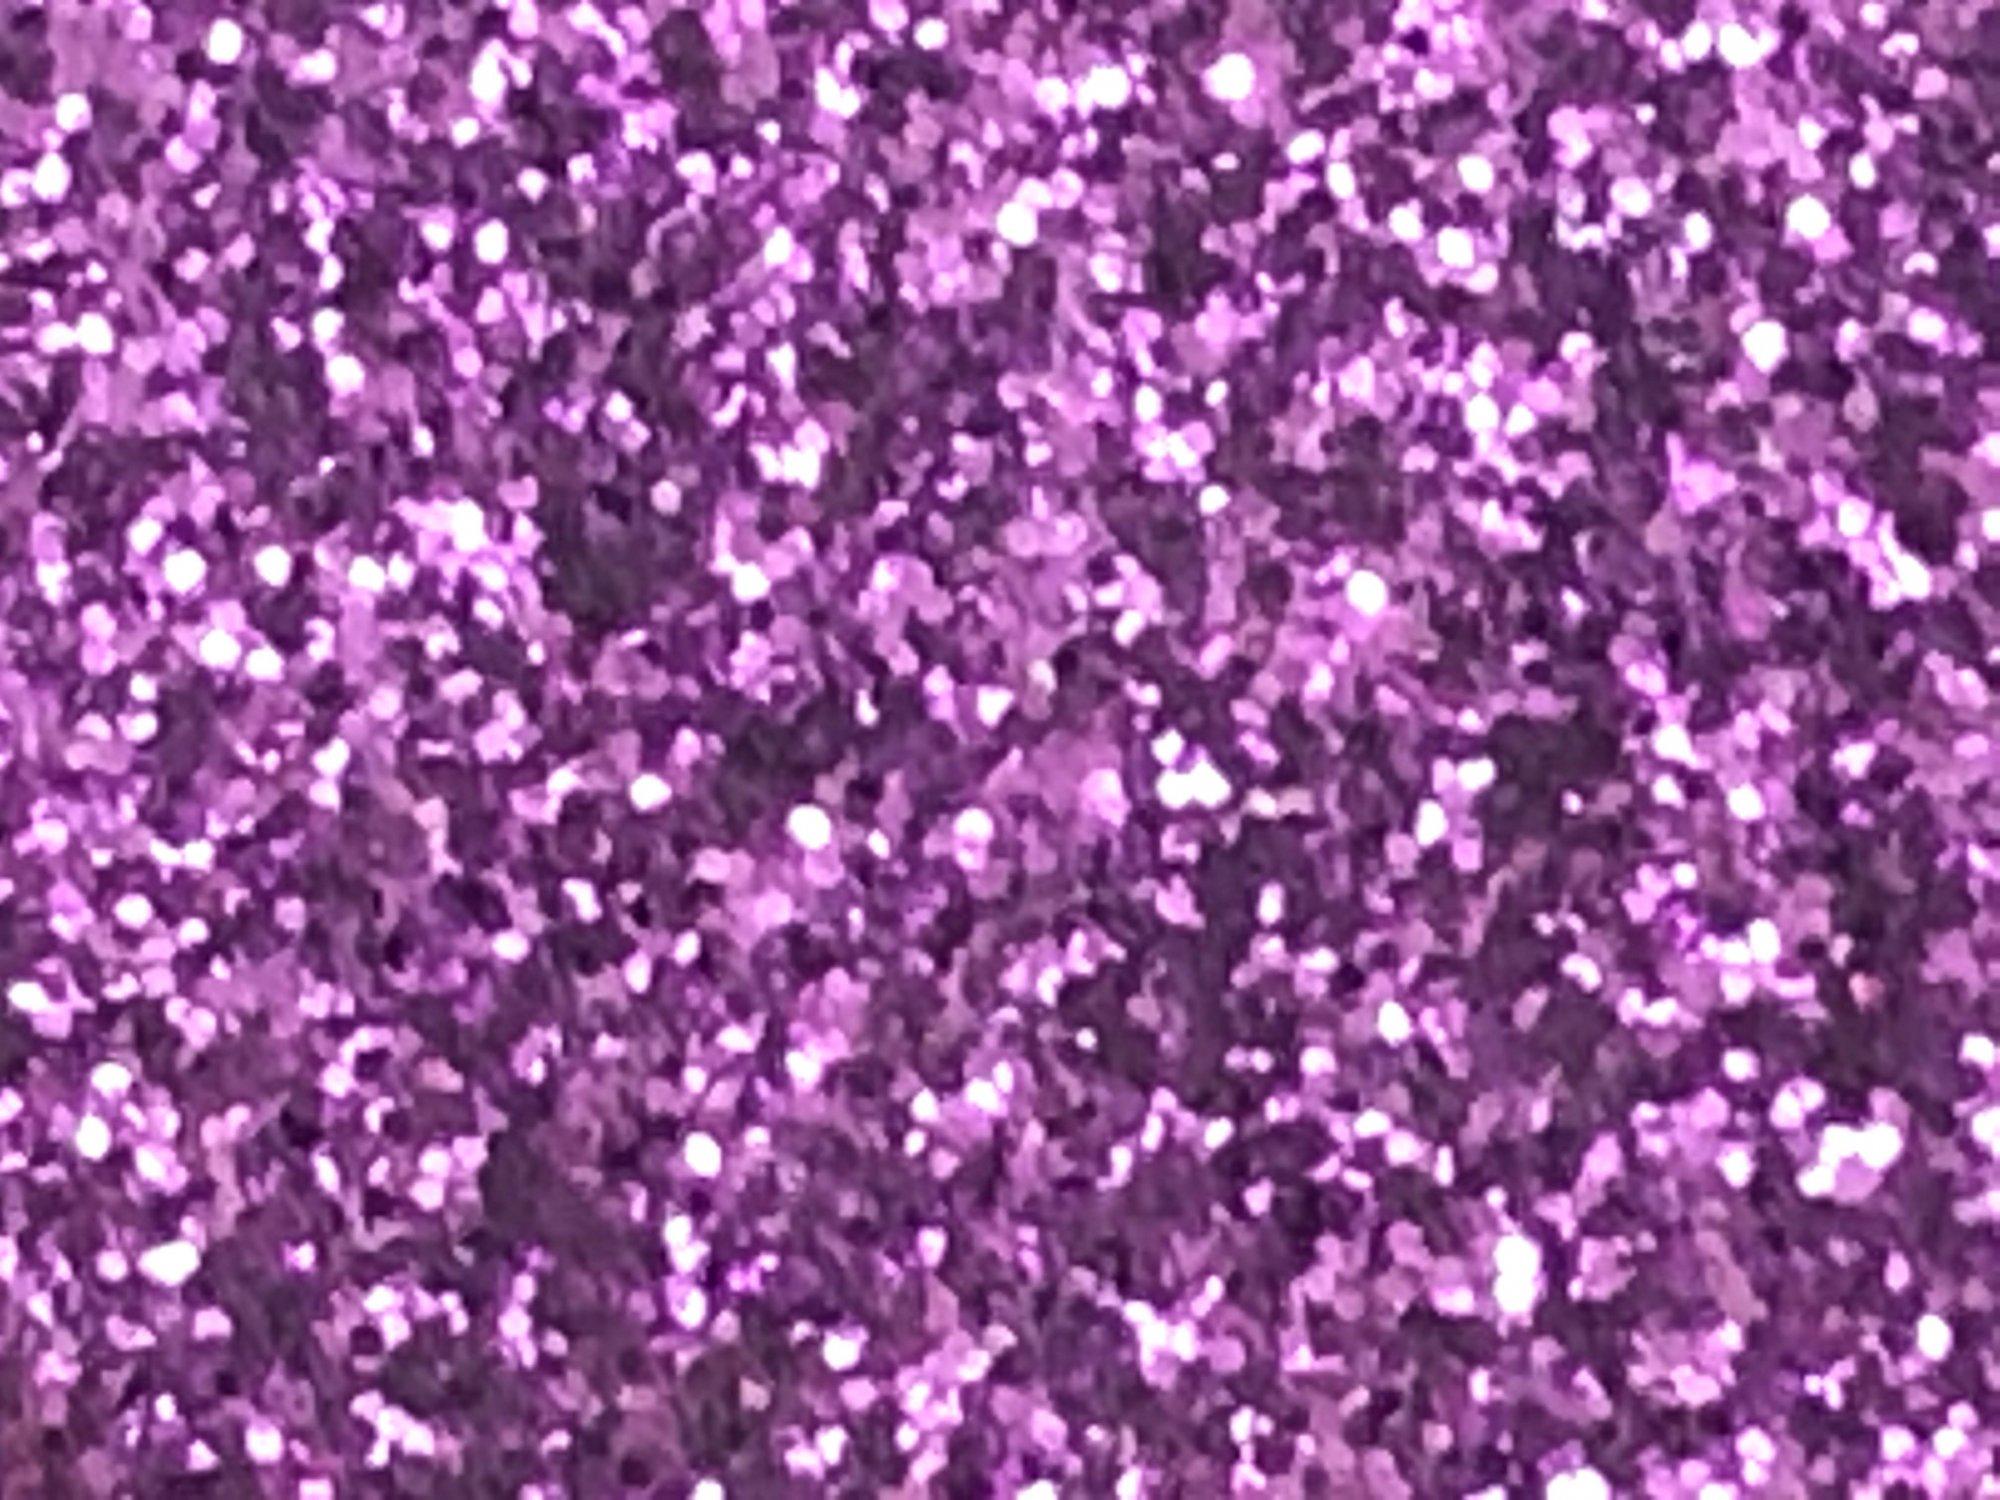 Stahls' Lavender Glitter Flake Heat Transfer Vinyl 12 x 20